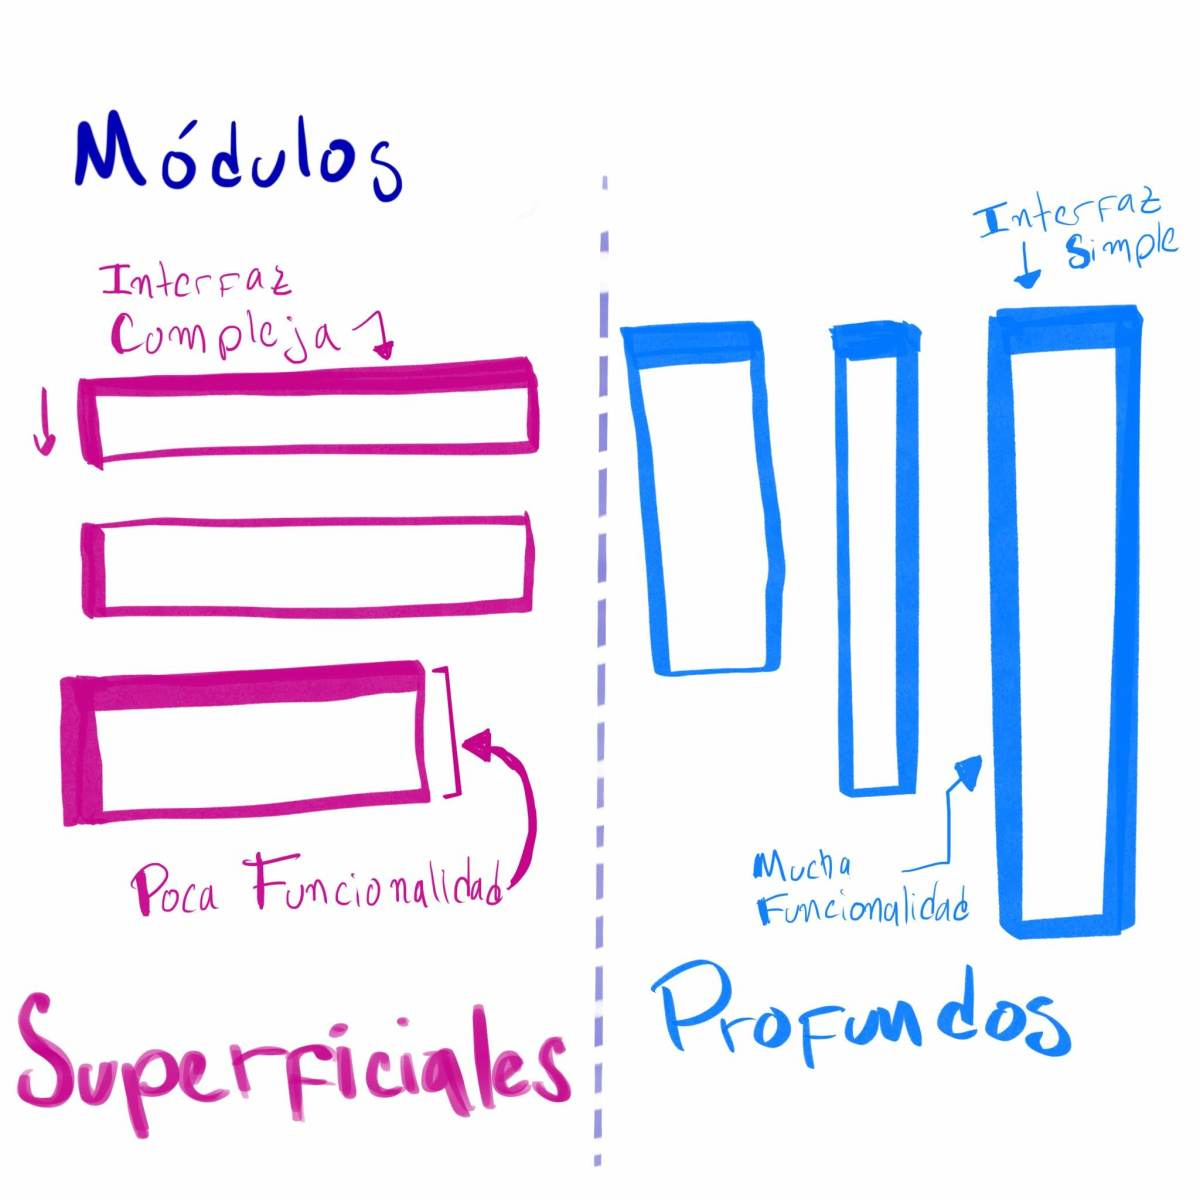 Módulos profundos vs superficiales